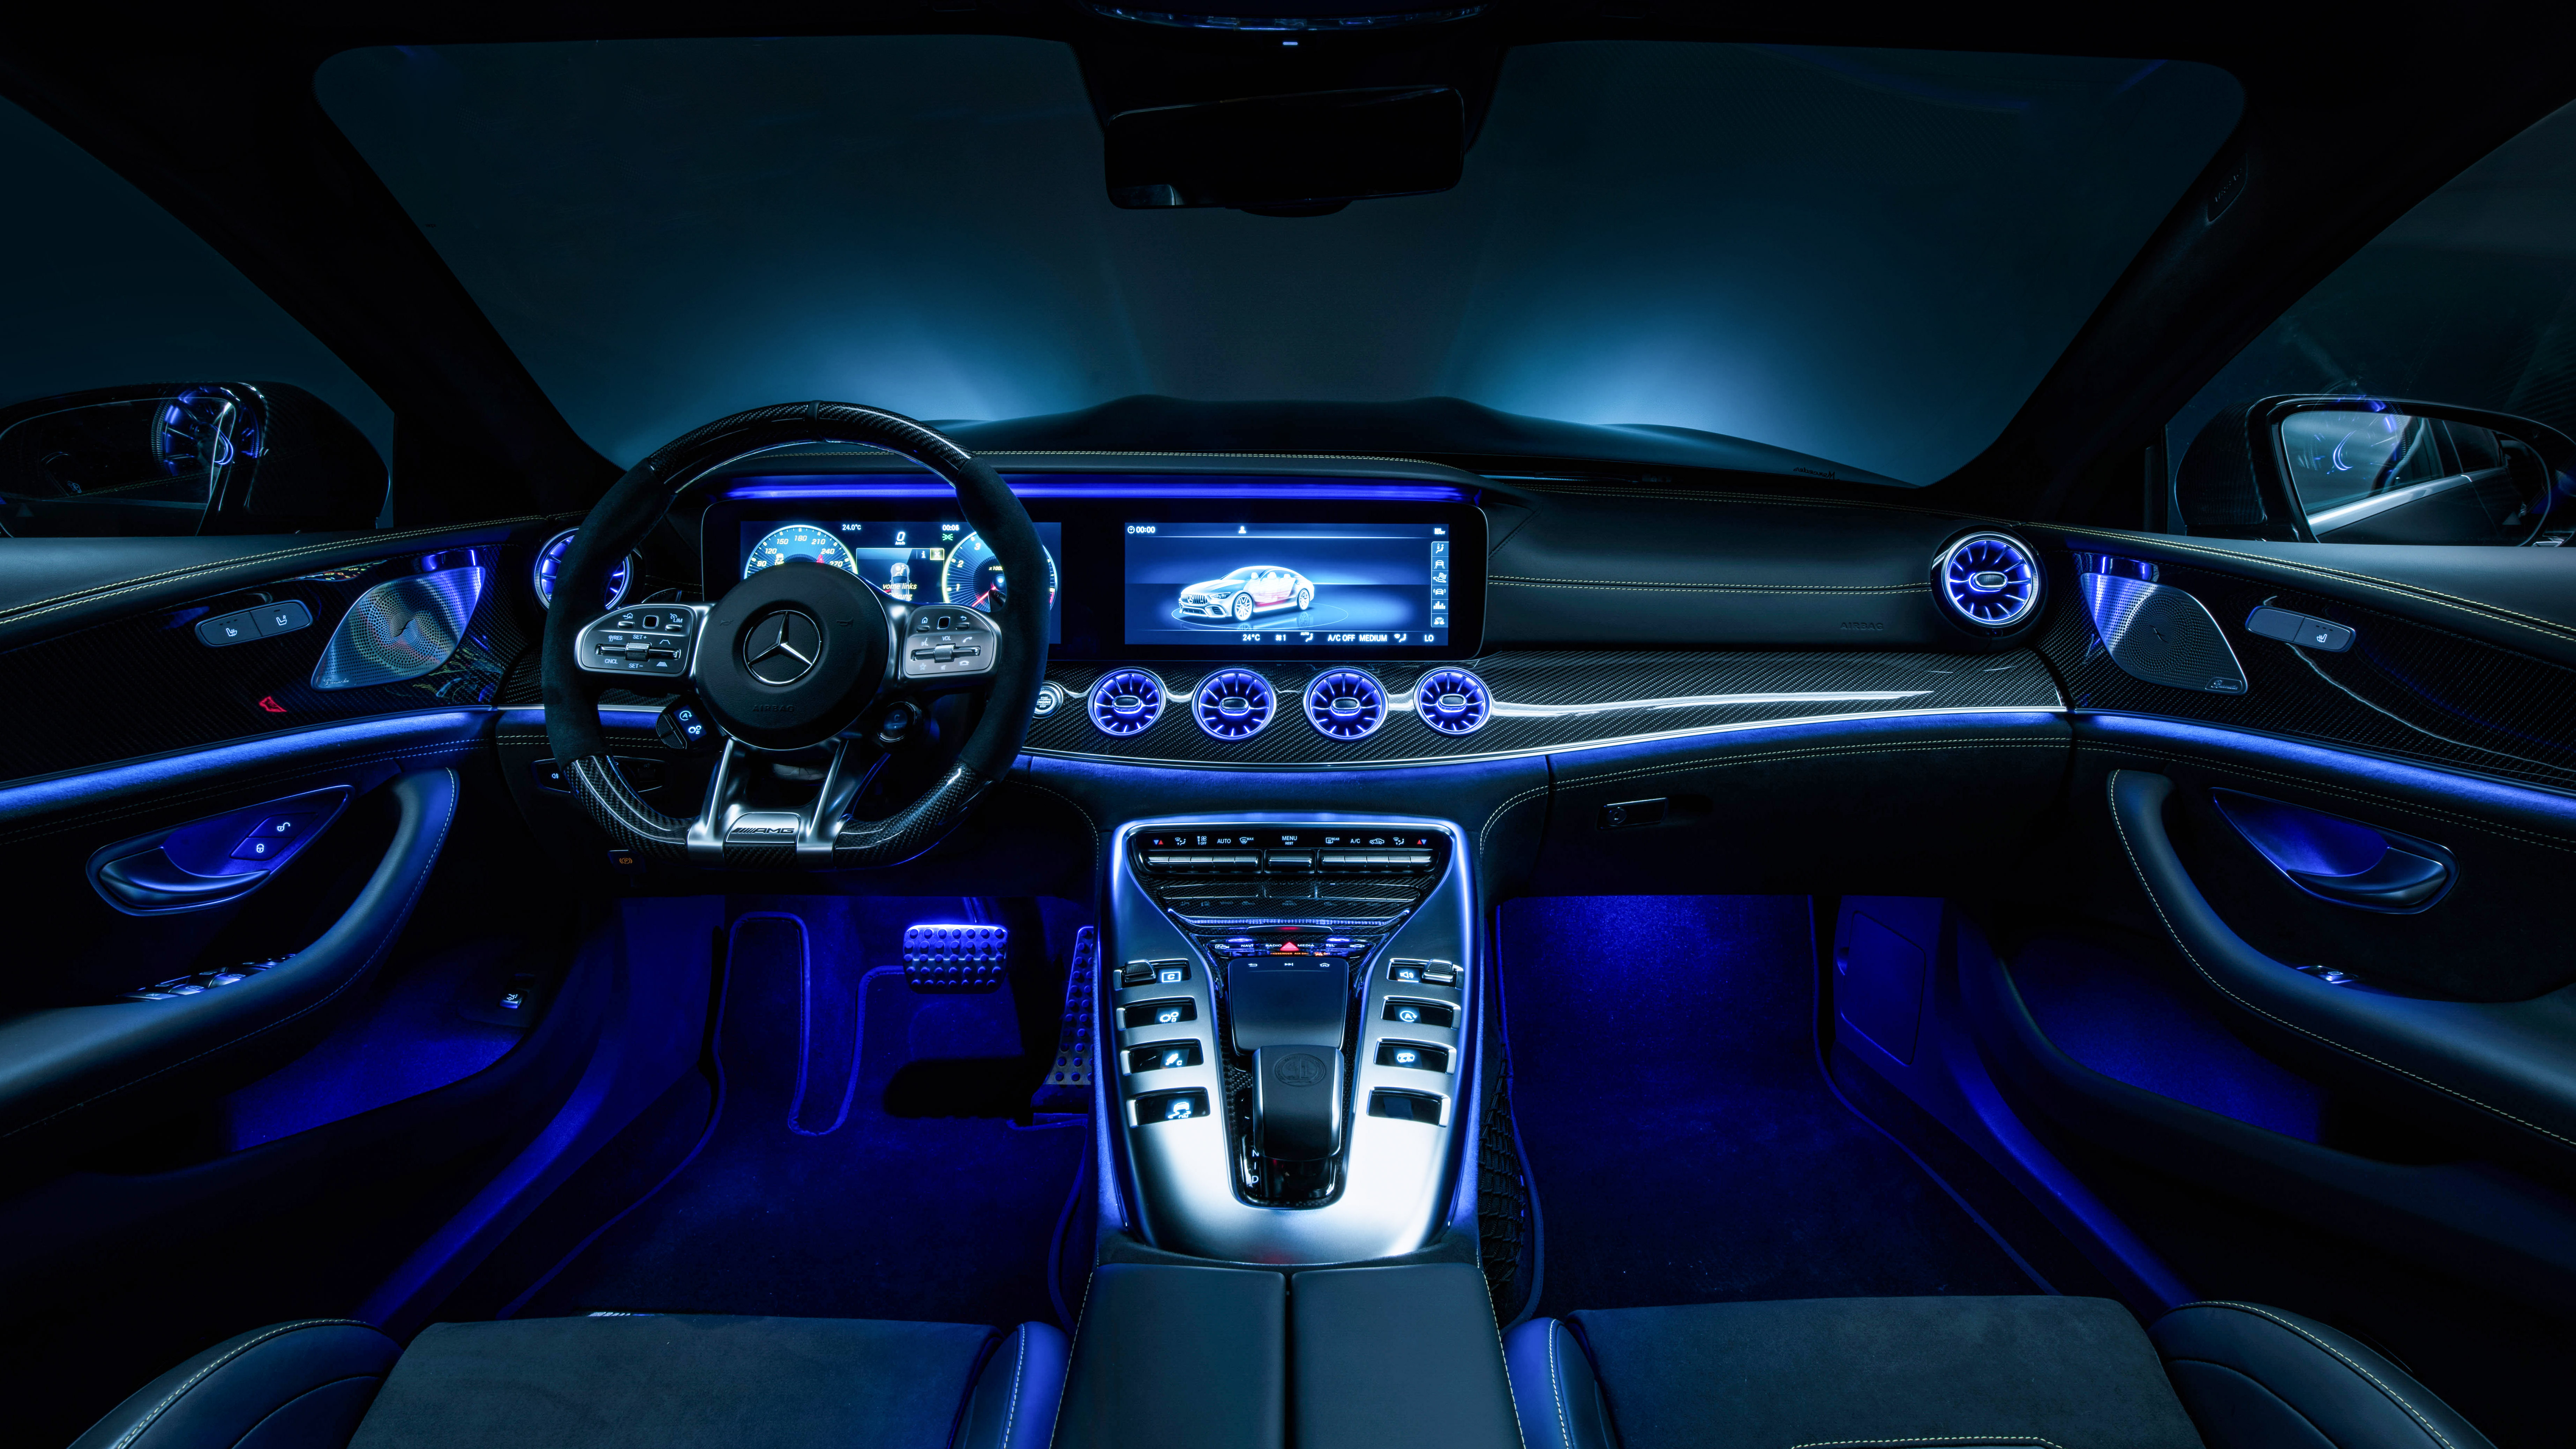 The Four Door Mercedes Amg Gt Is Finally Here Top Gear